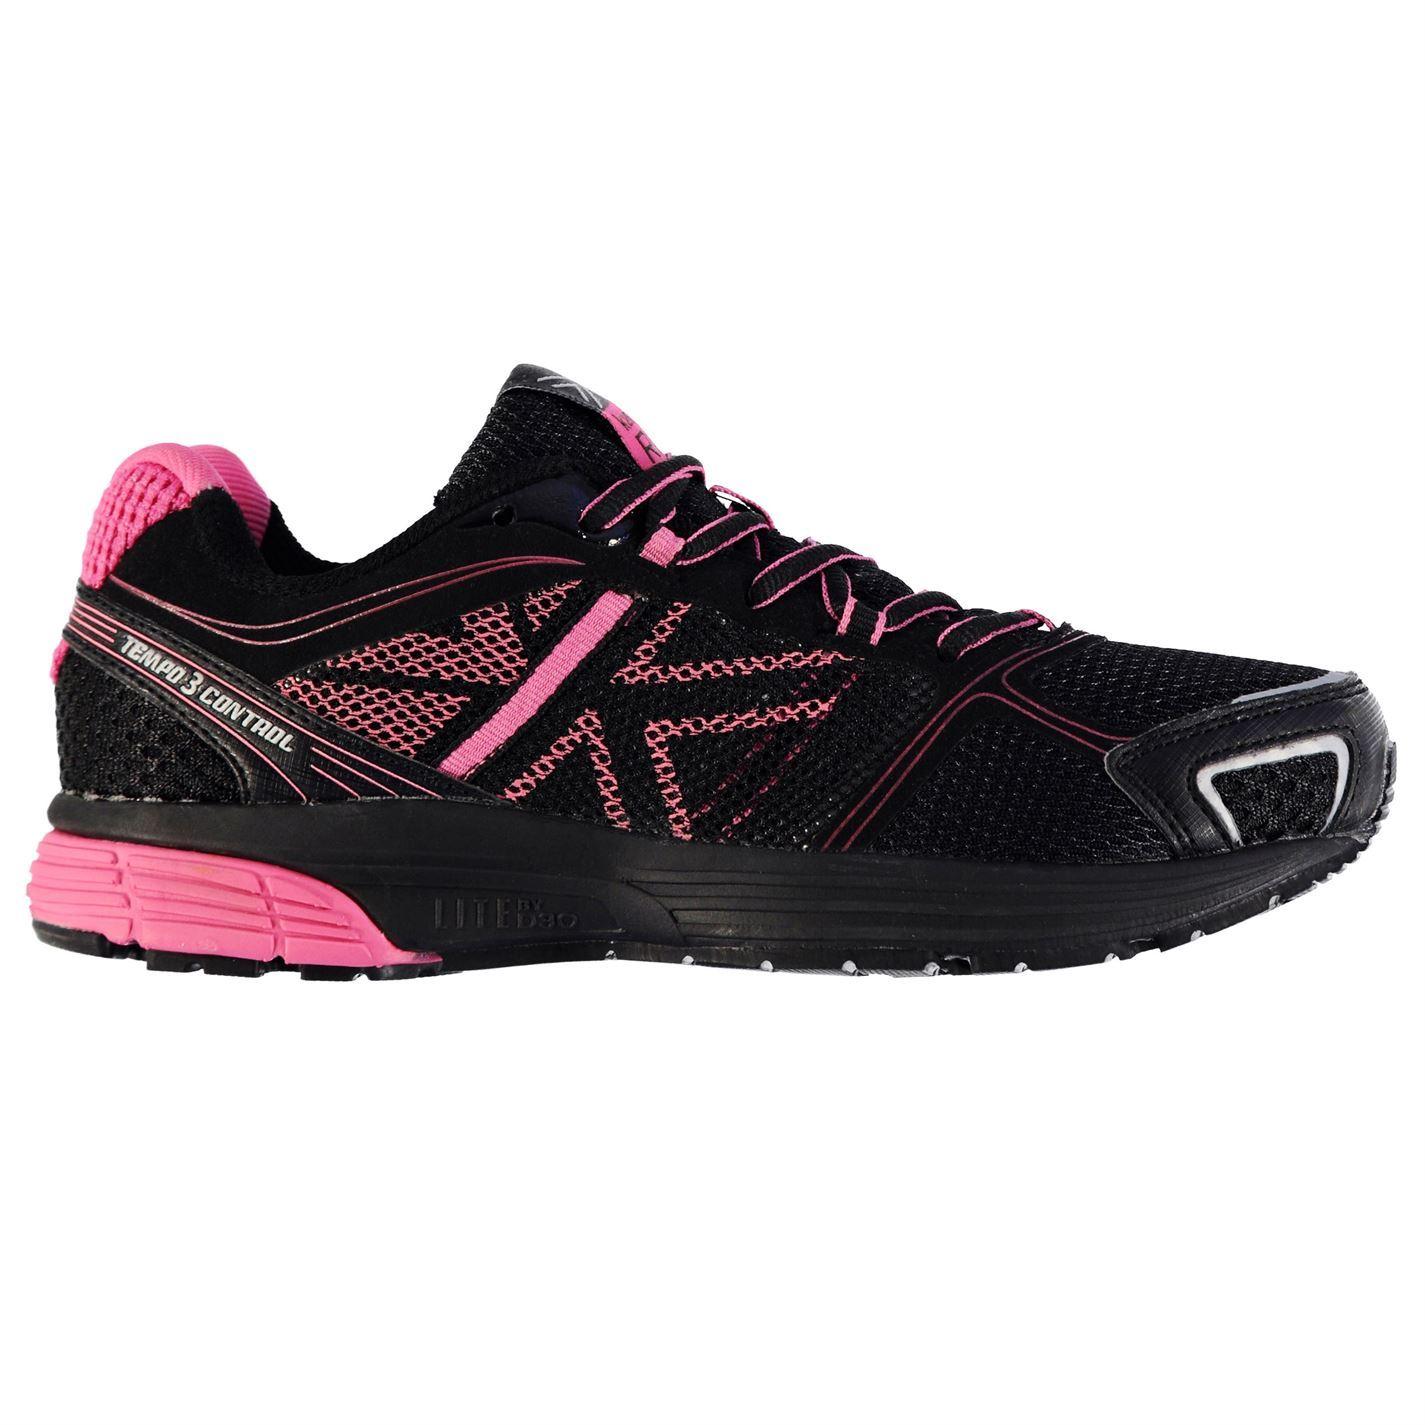 Karrimor Ladies Trail Running Shoes